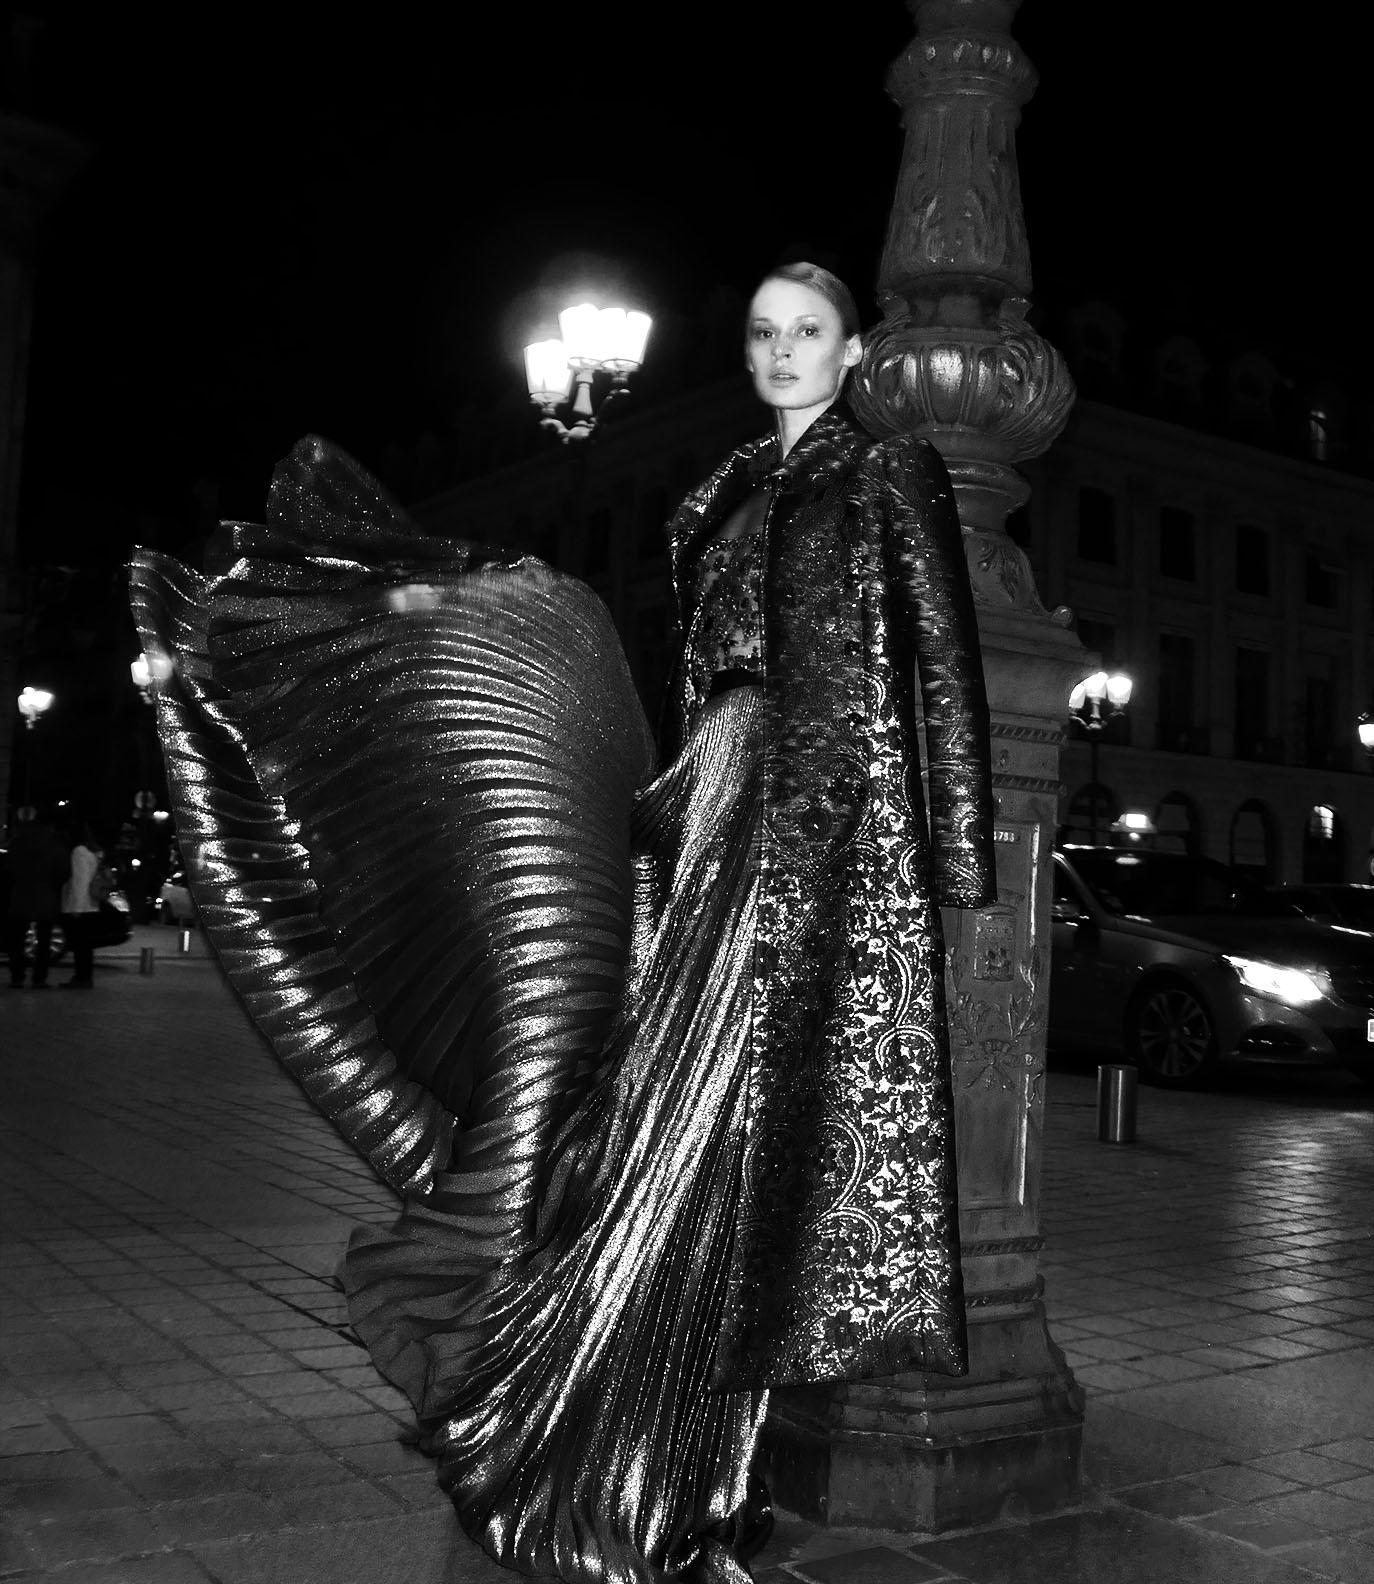 Lexa Shevchenko